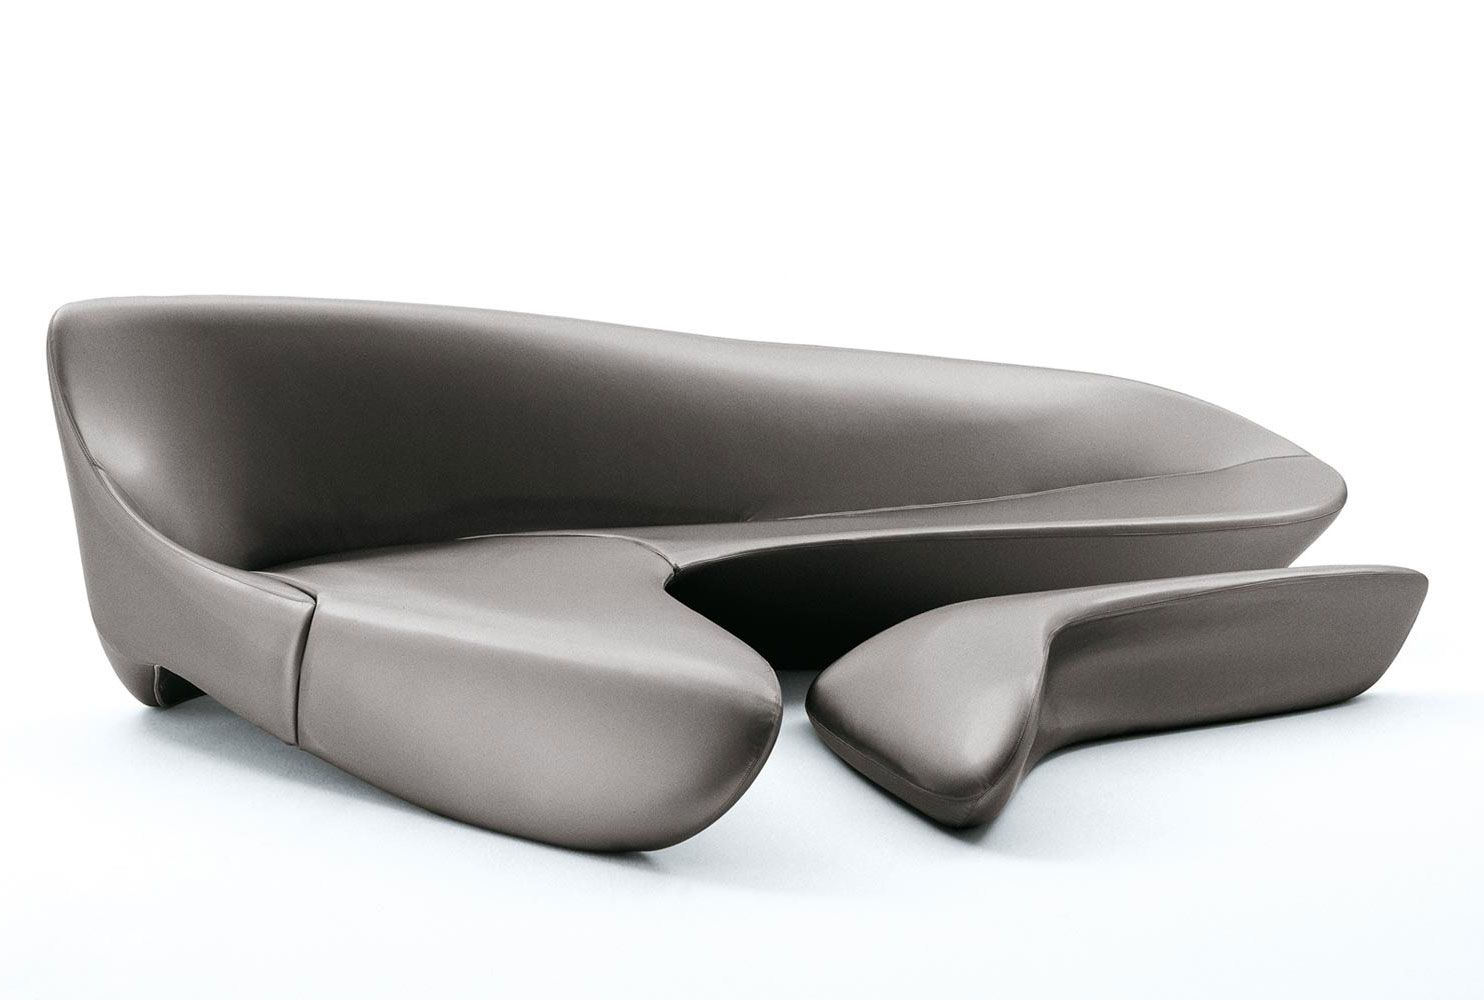 B b mobili ~ Sofa: moon system collection: b&b italia design: zaha hadid